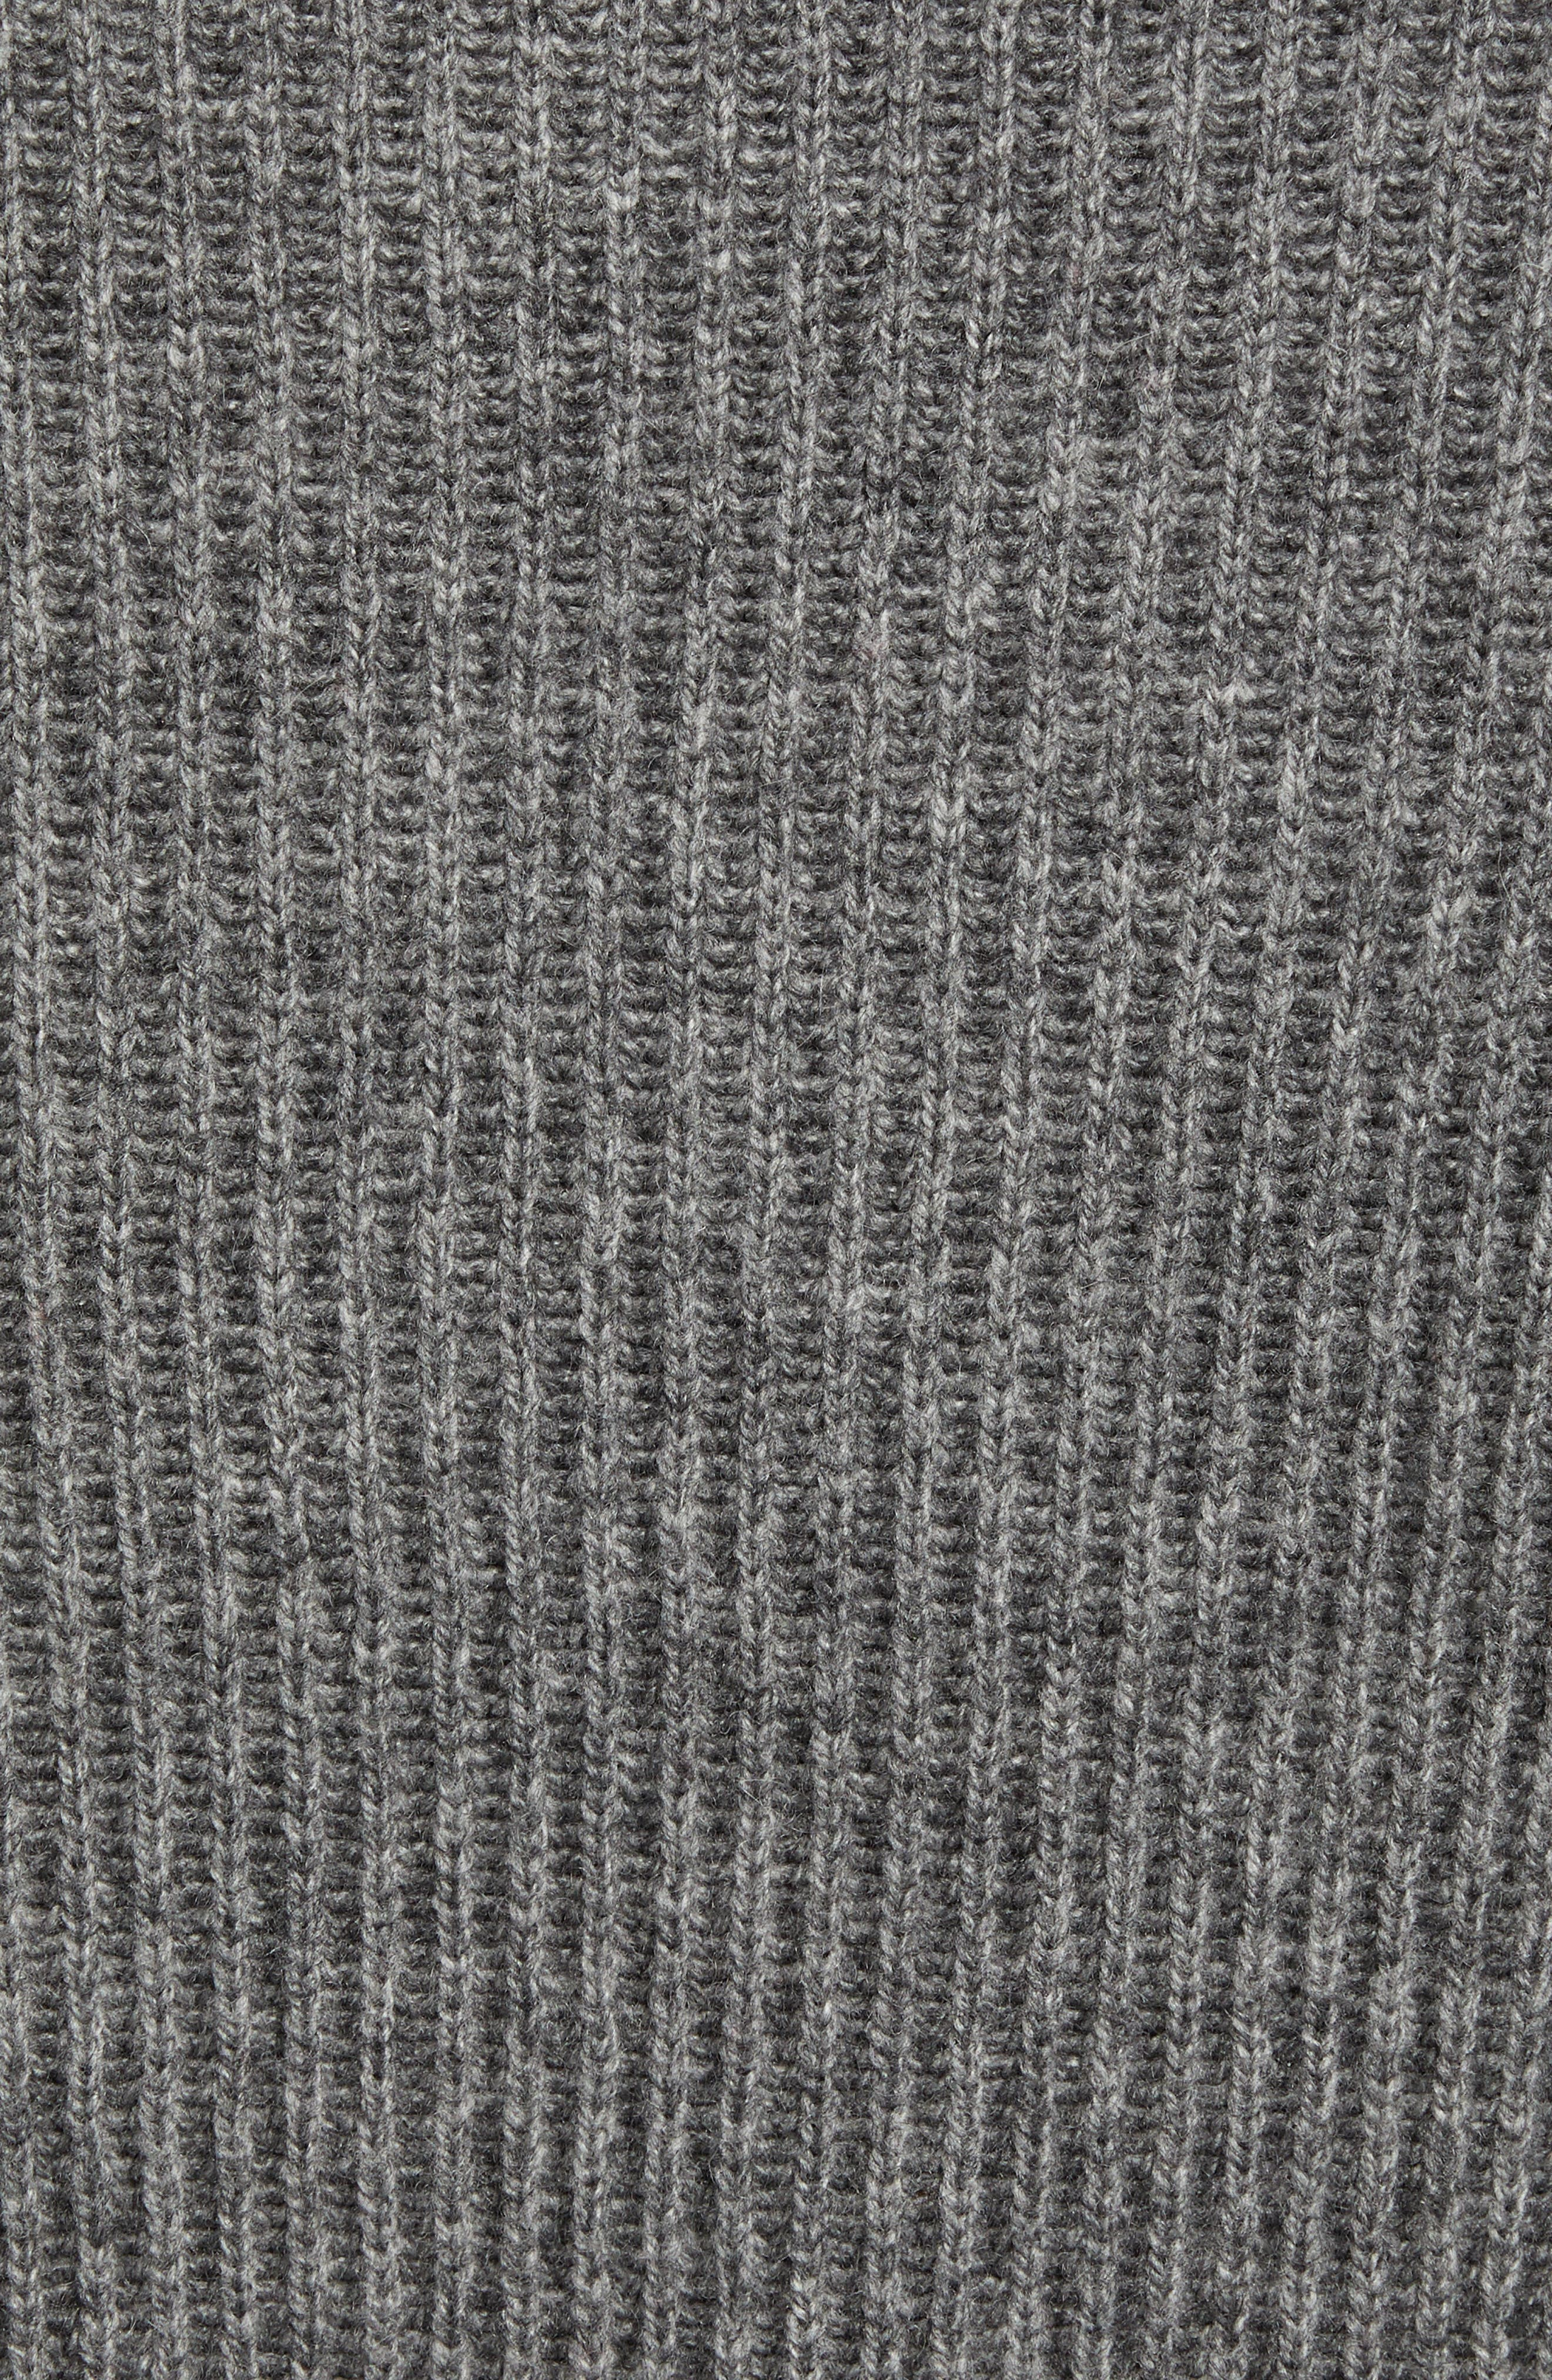 Mountainside Wool Blend Shawl Sweater,                             Alternate thumbnail 5, color,                             025